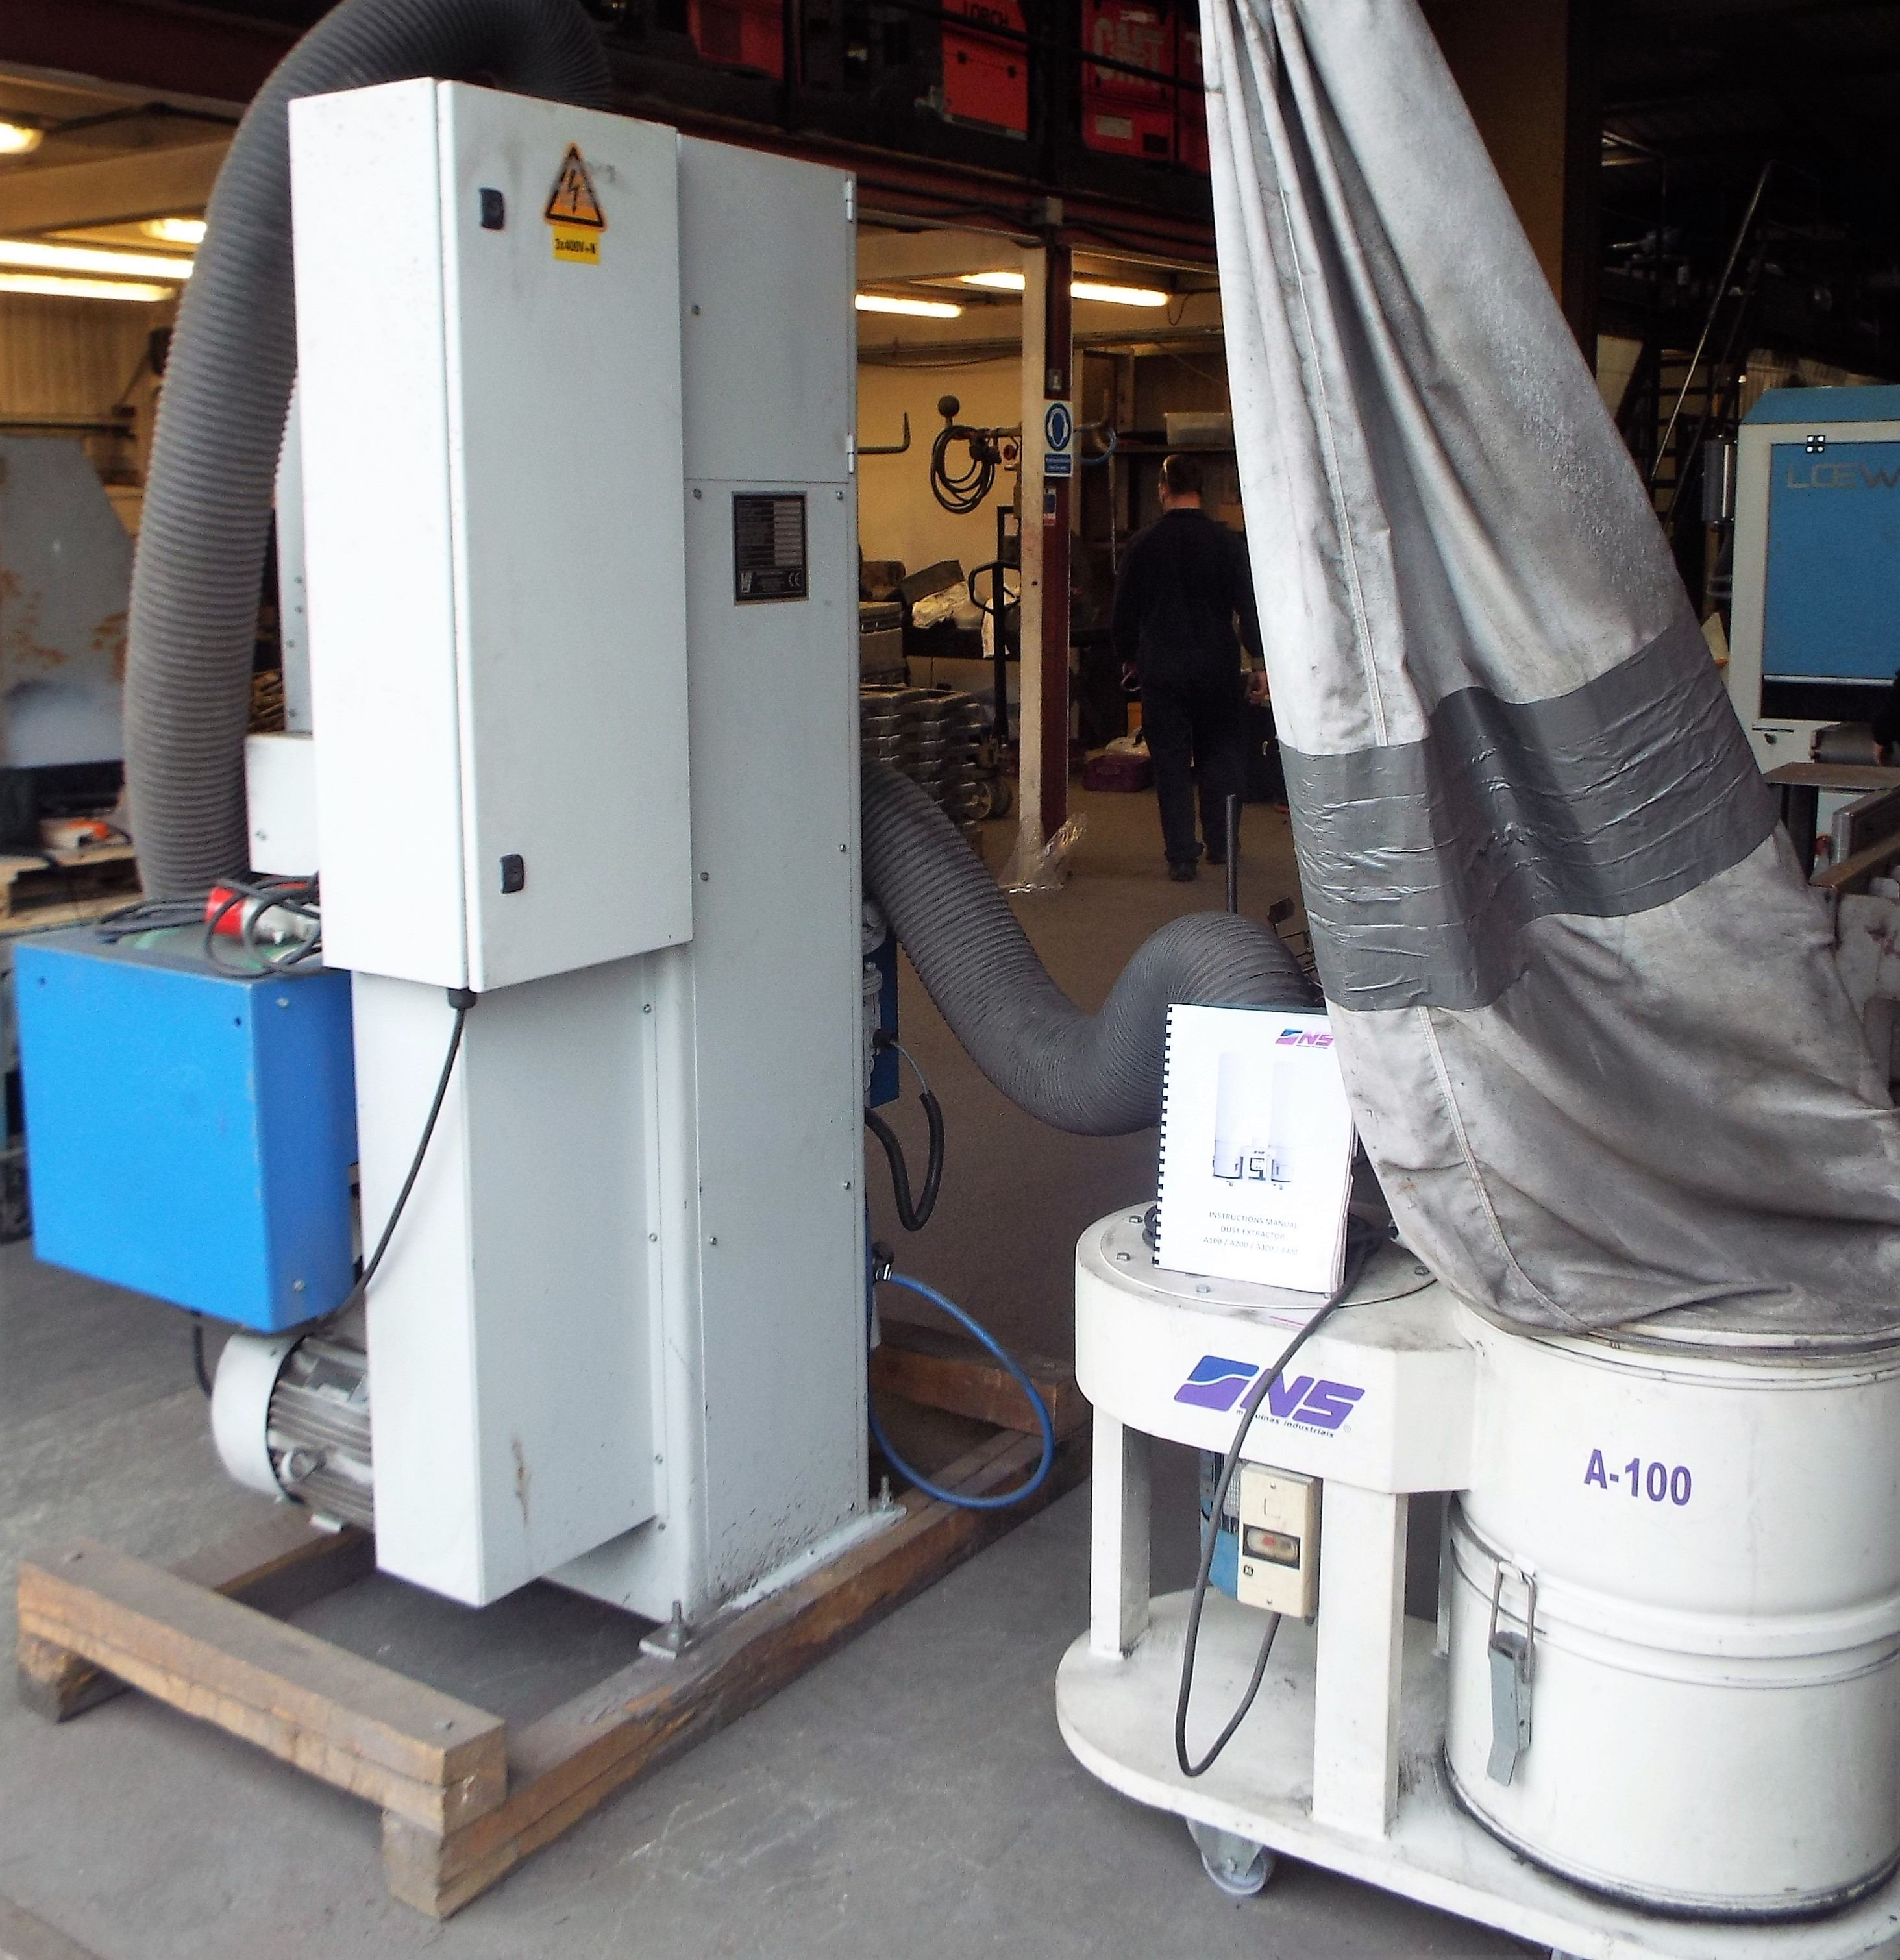 Lot 17 - Vangroenweghe T-300K Sheet Metal Linishing Unit & Dust Extraction System.